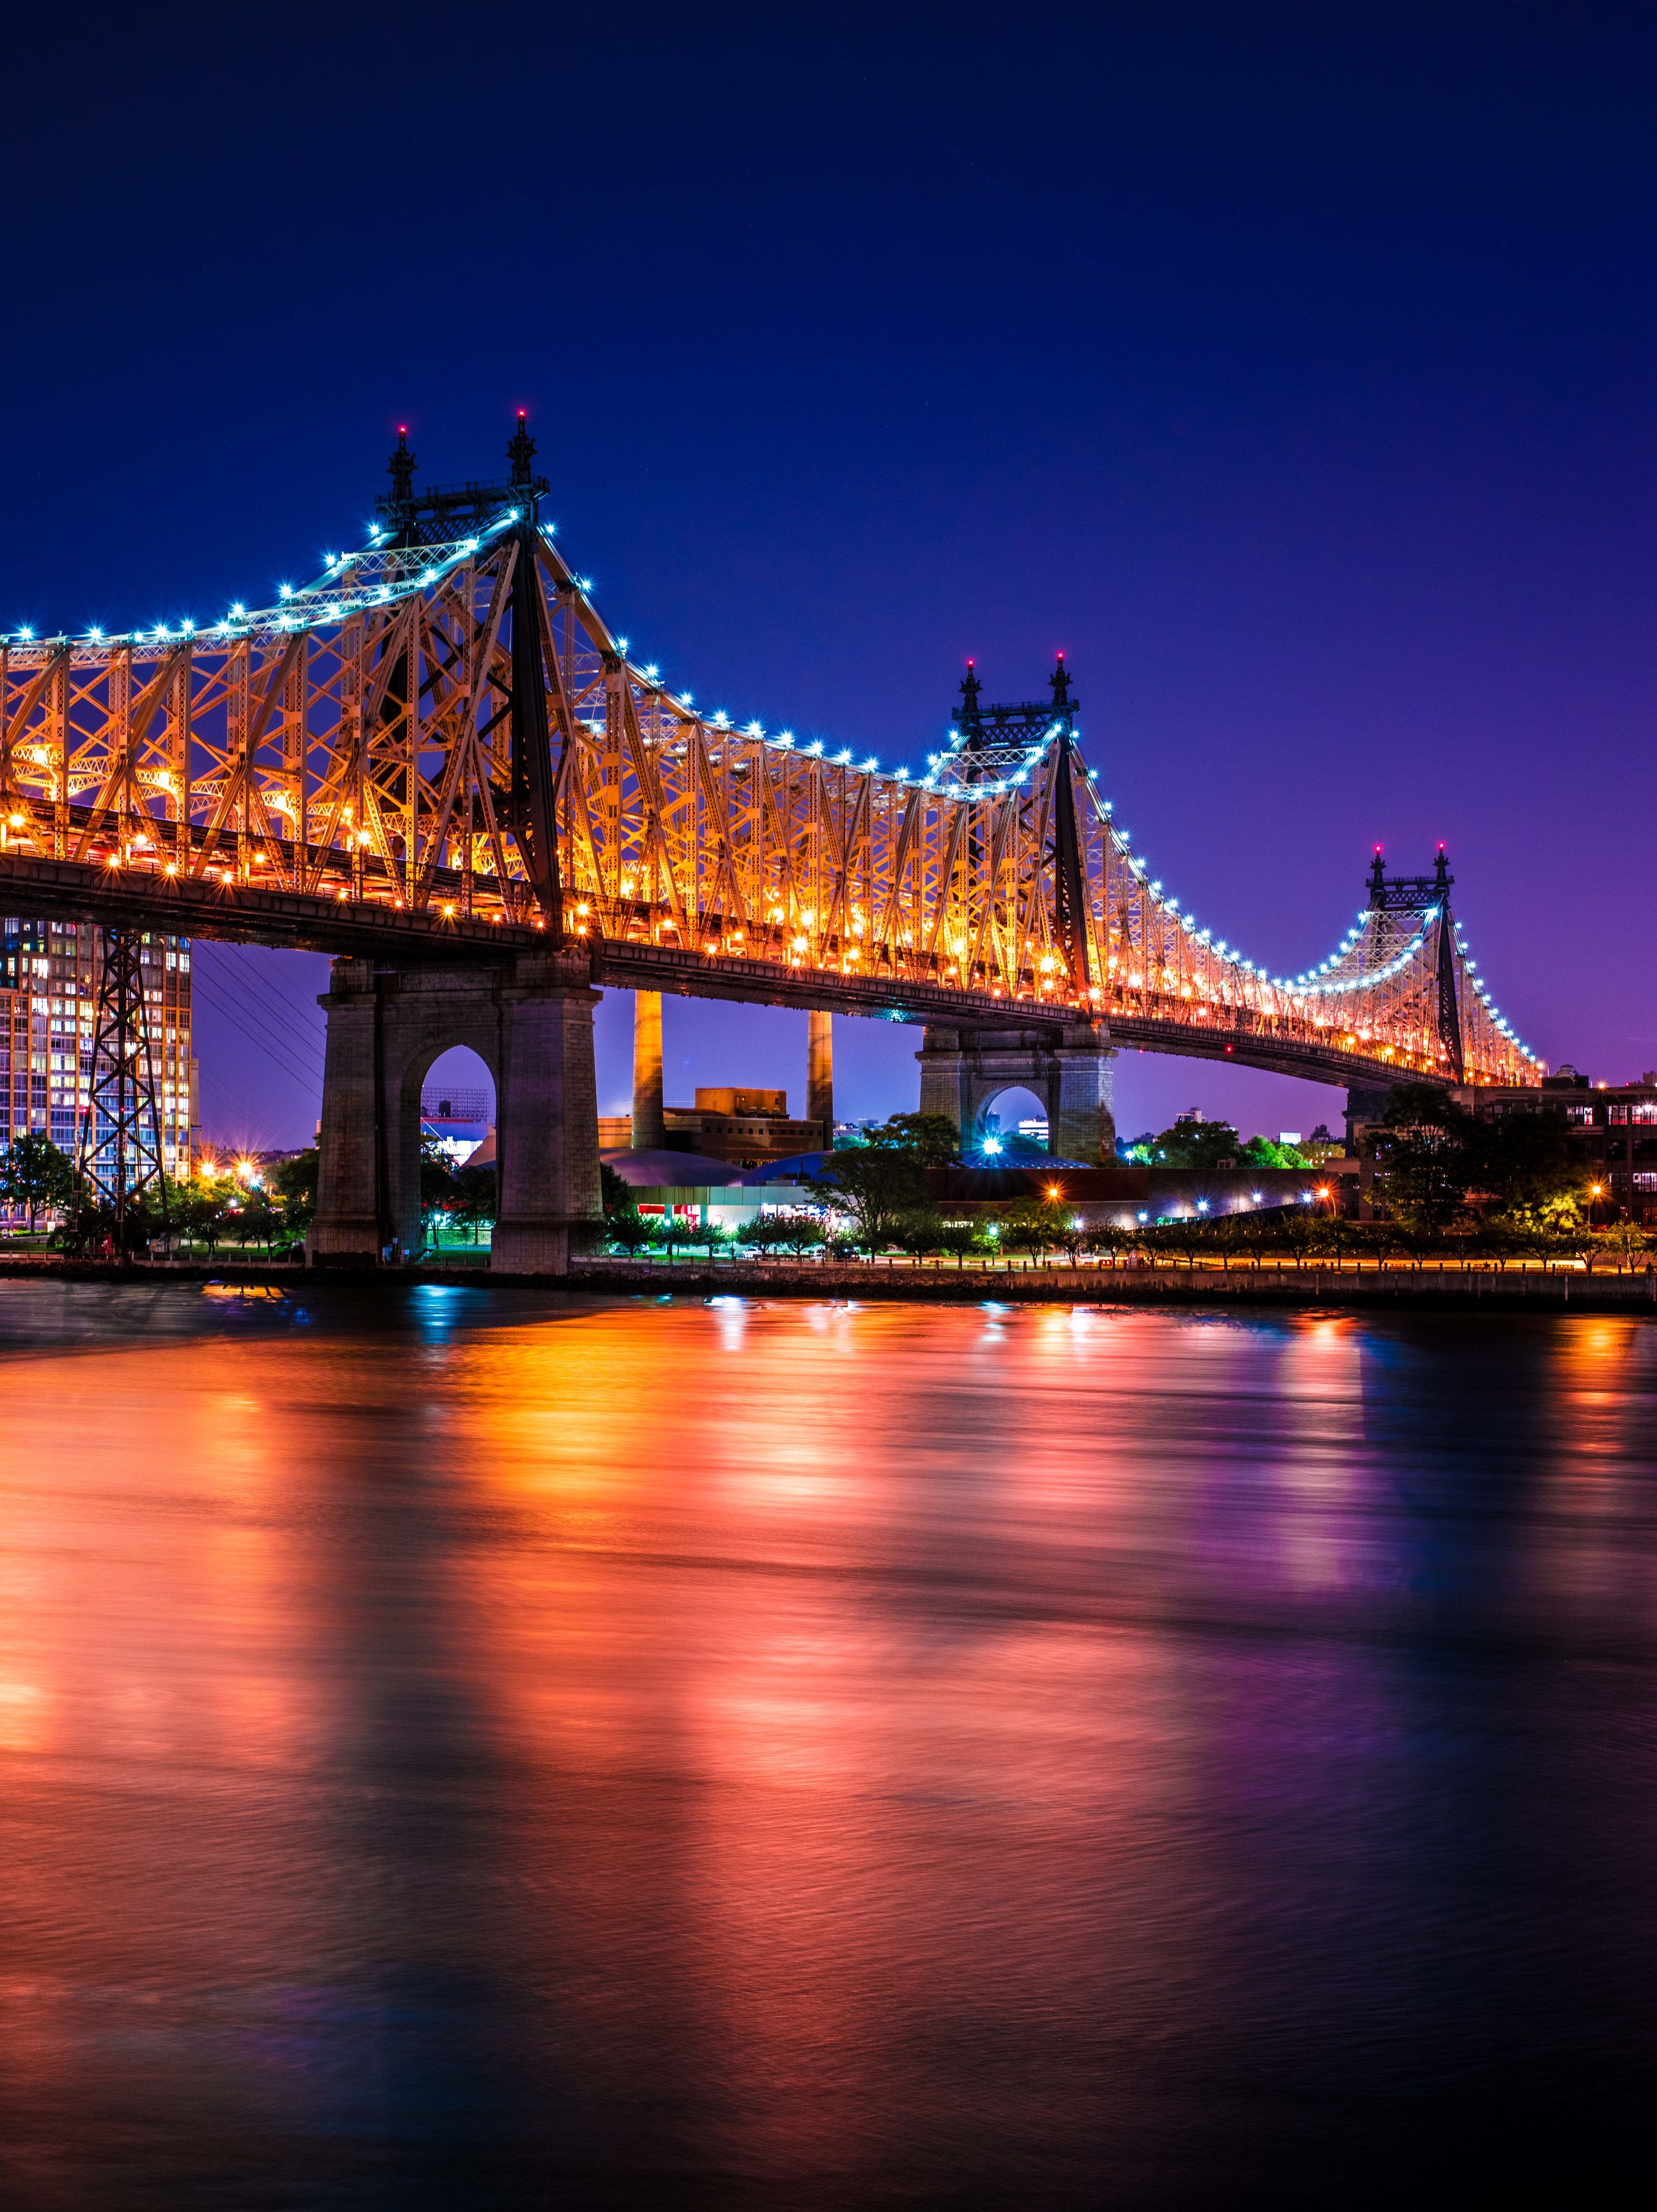 59th Street - NYC 2014 - Pentax 645D